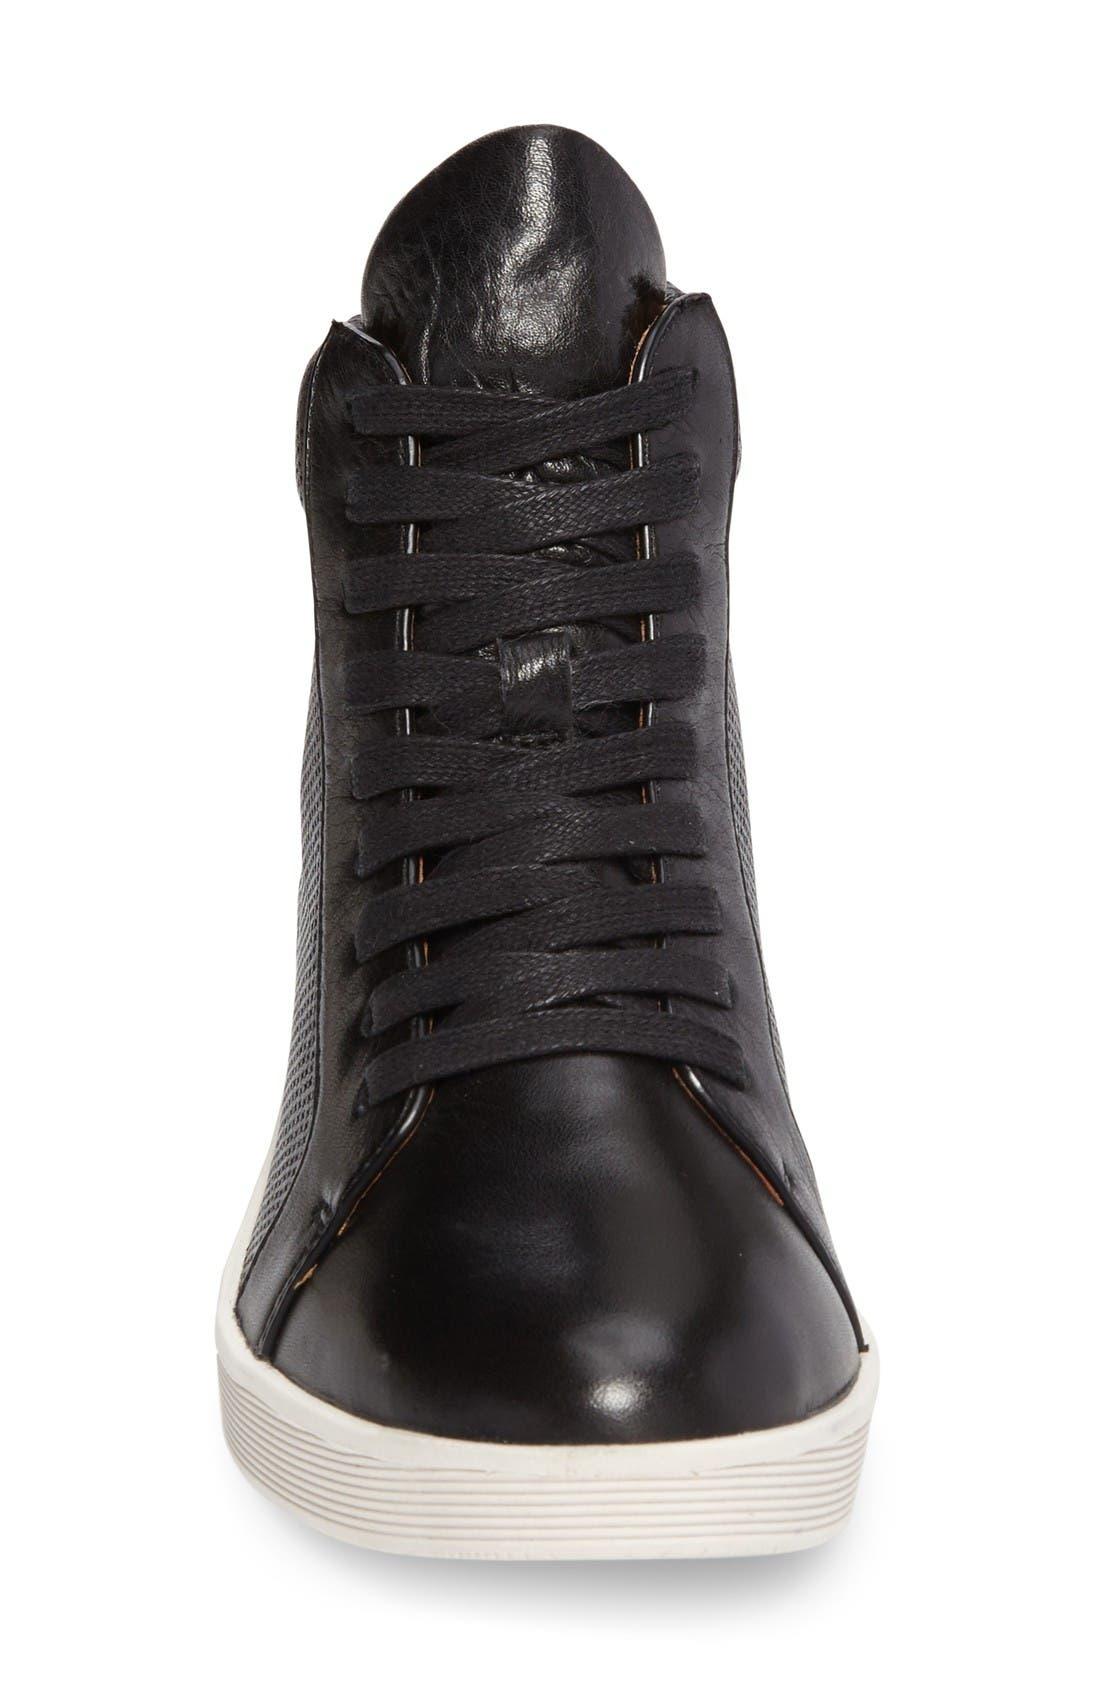 Helka High Top Sneaker,                             Alternate thumbnail 3, color,                             Black Leather